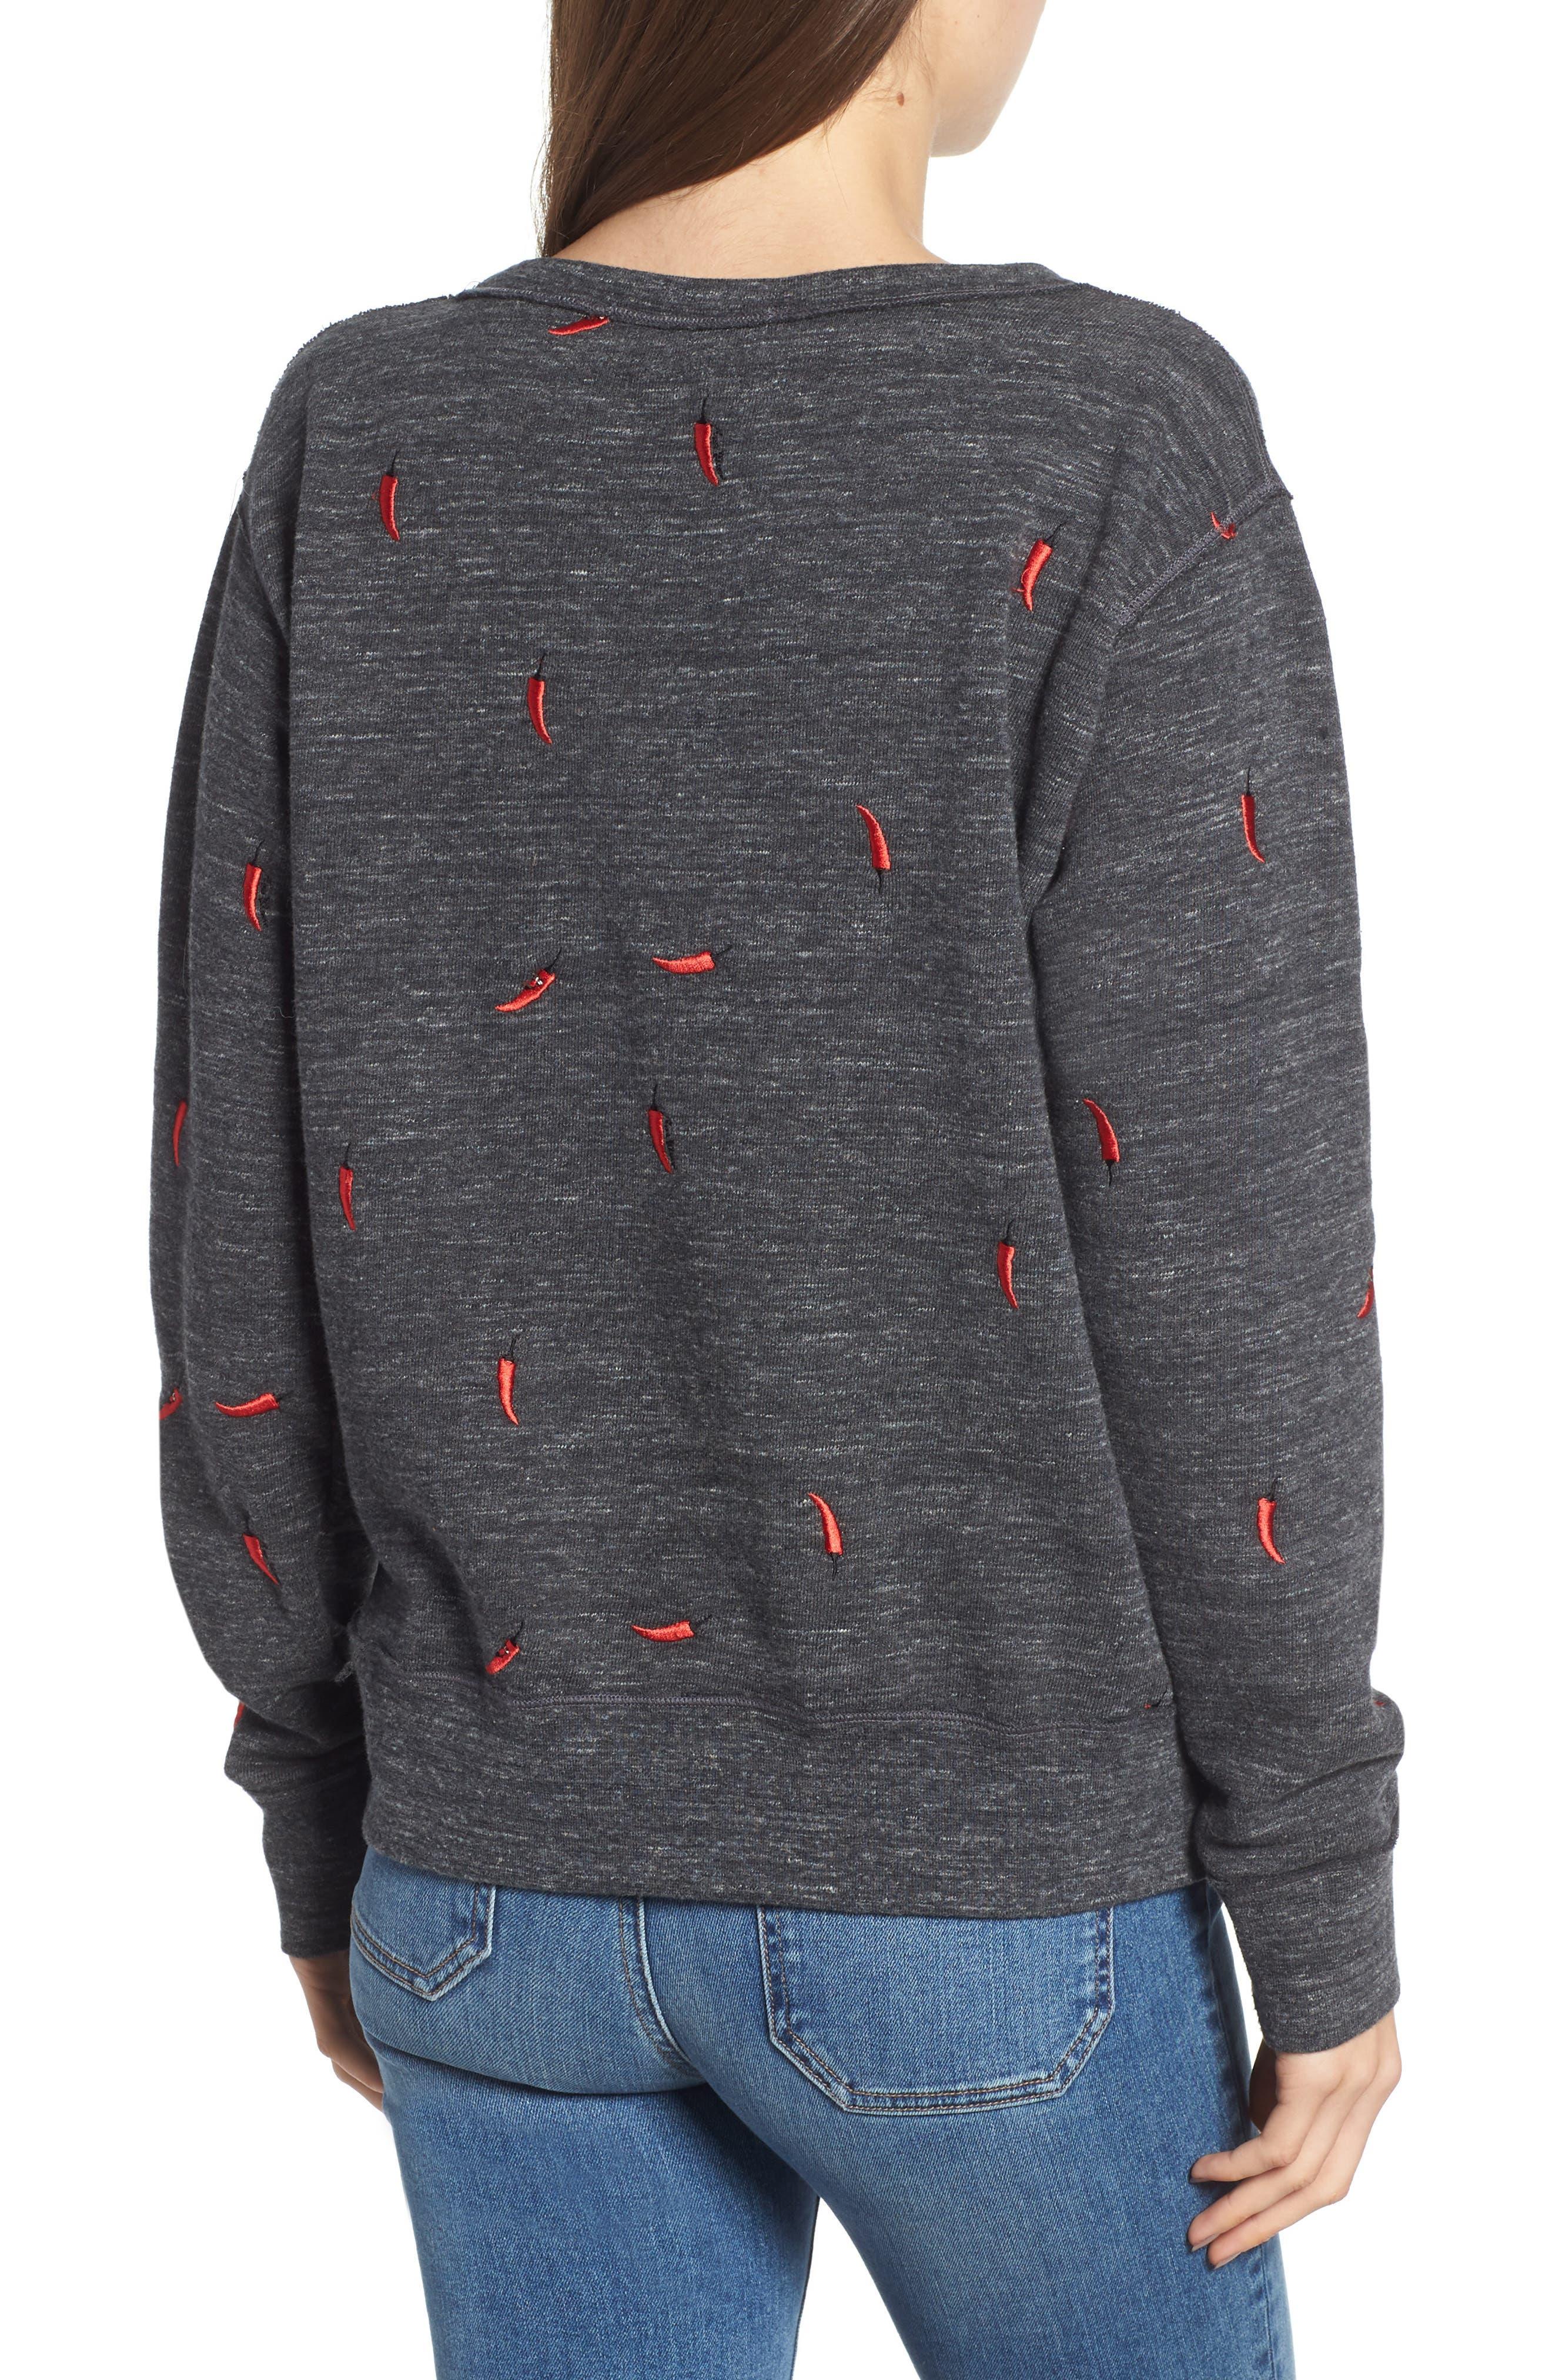 Chili Pepper Crewneck Sweatshirt,                             Alternate thumbnail 2, color,                             021